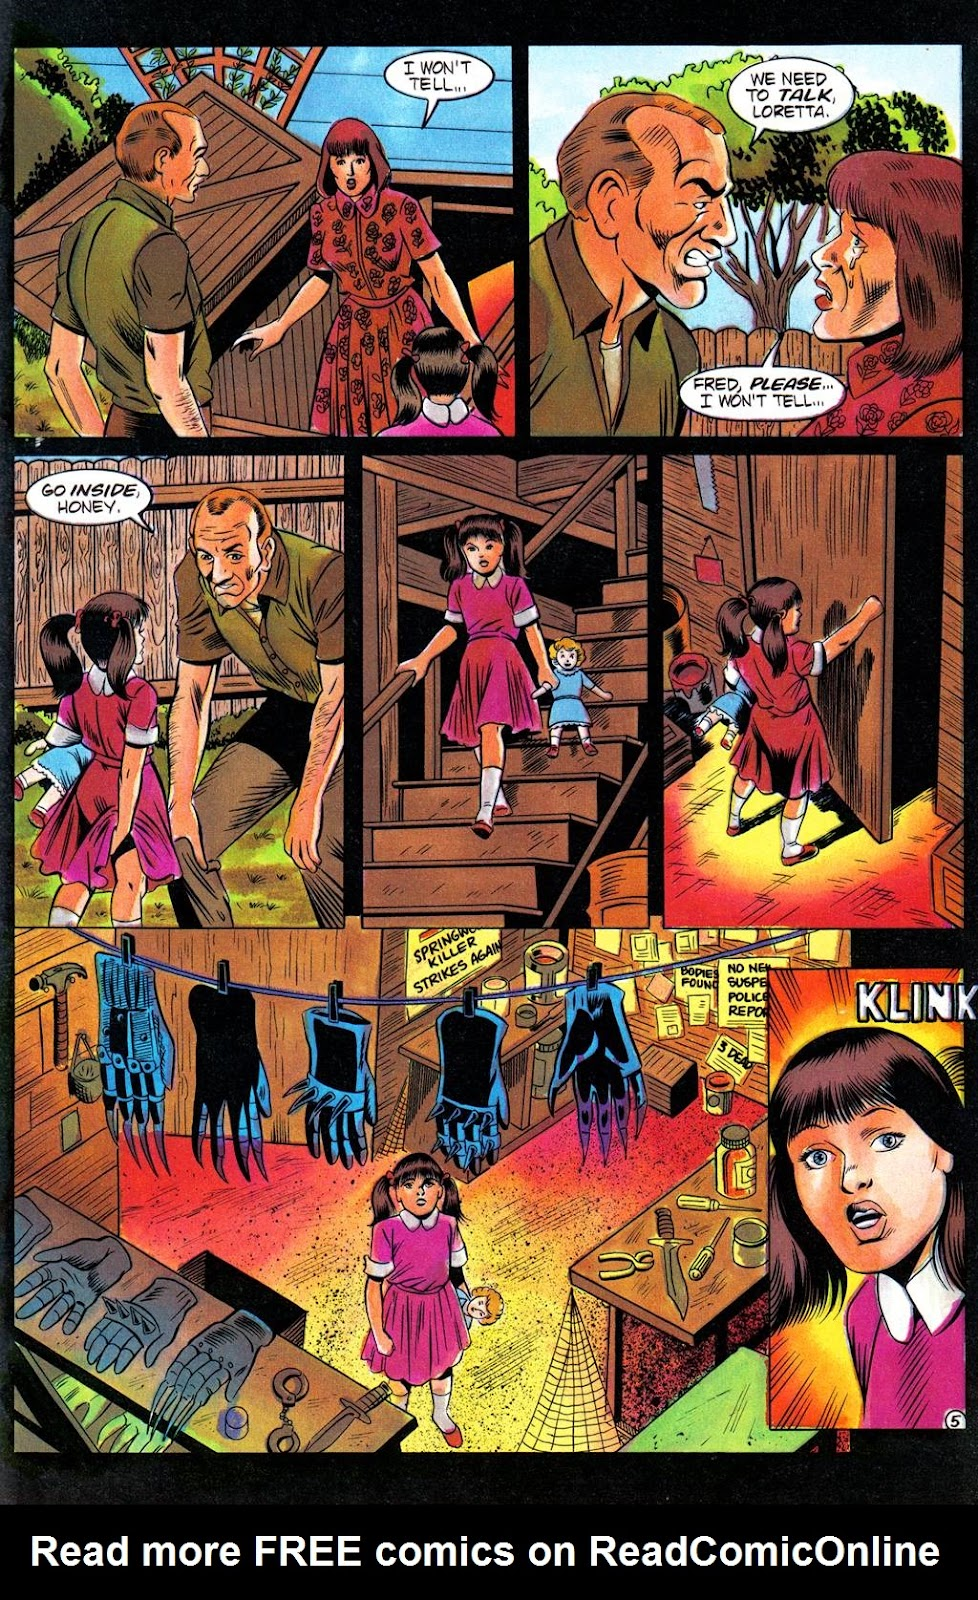 Read online Freddy's Dead: The Final Nightmare comic -  Issue #3 - 7